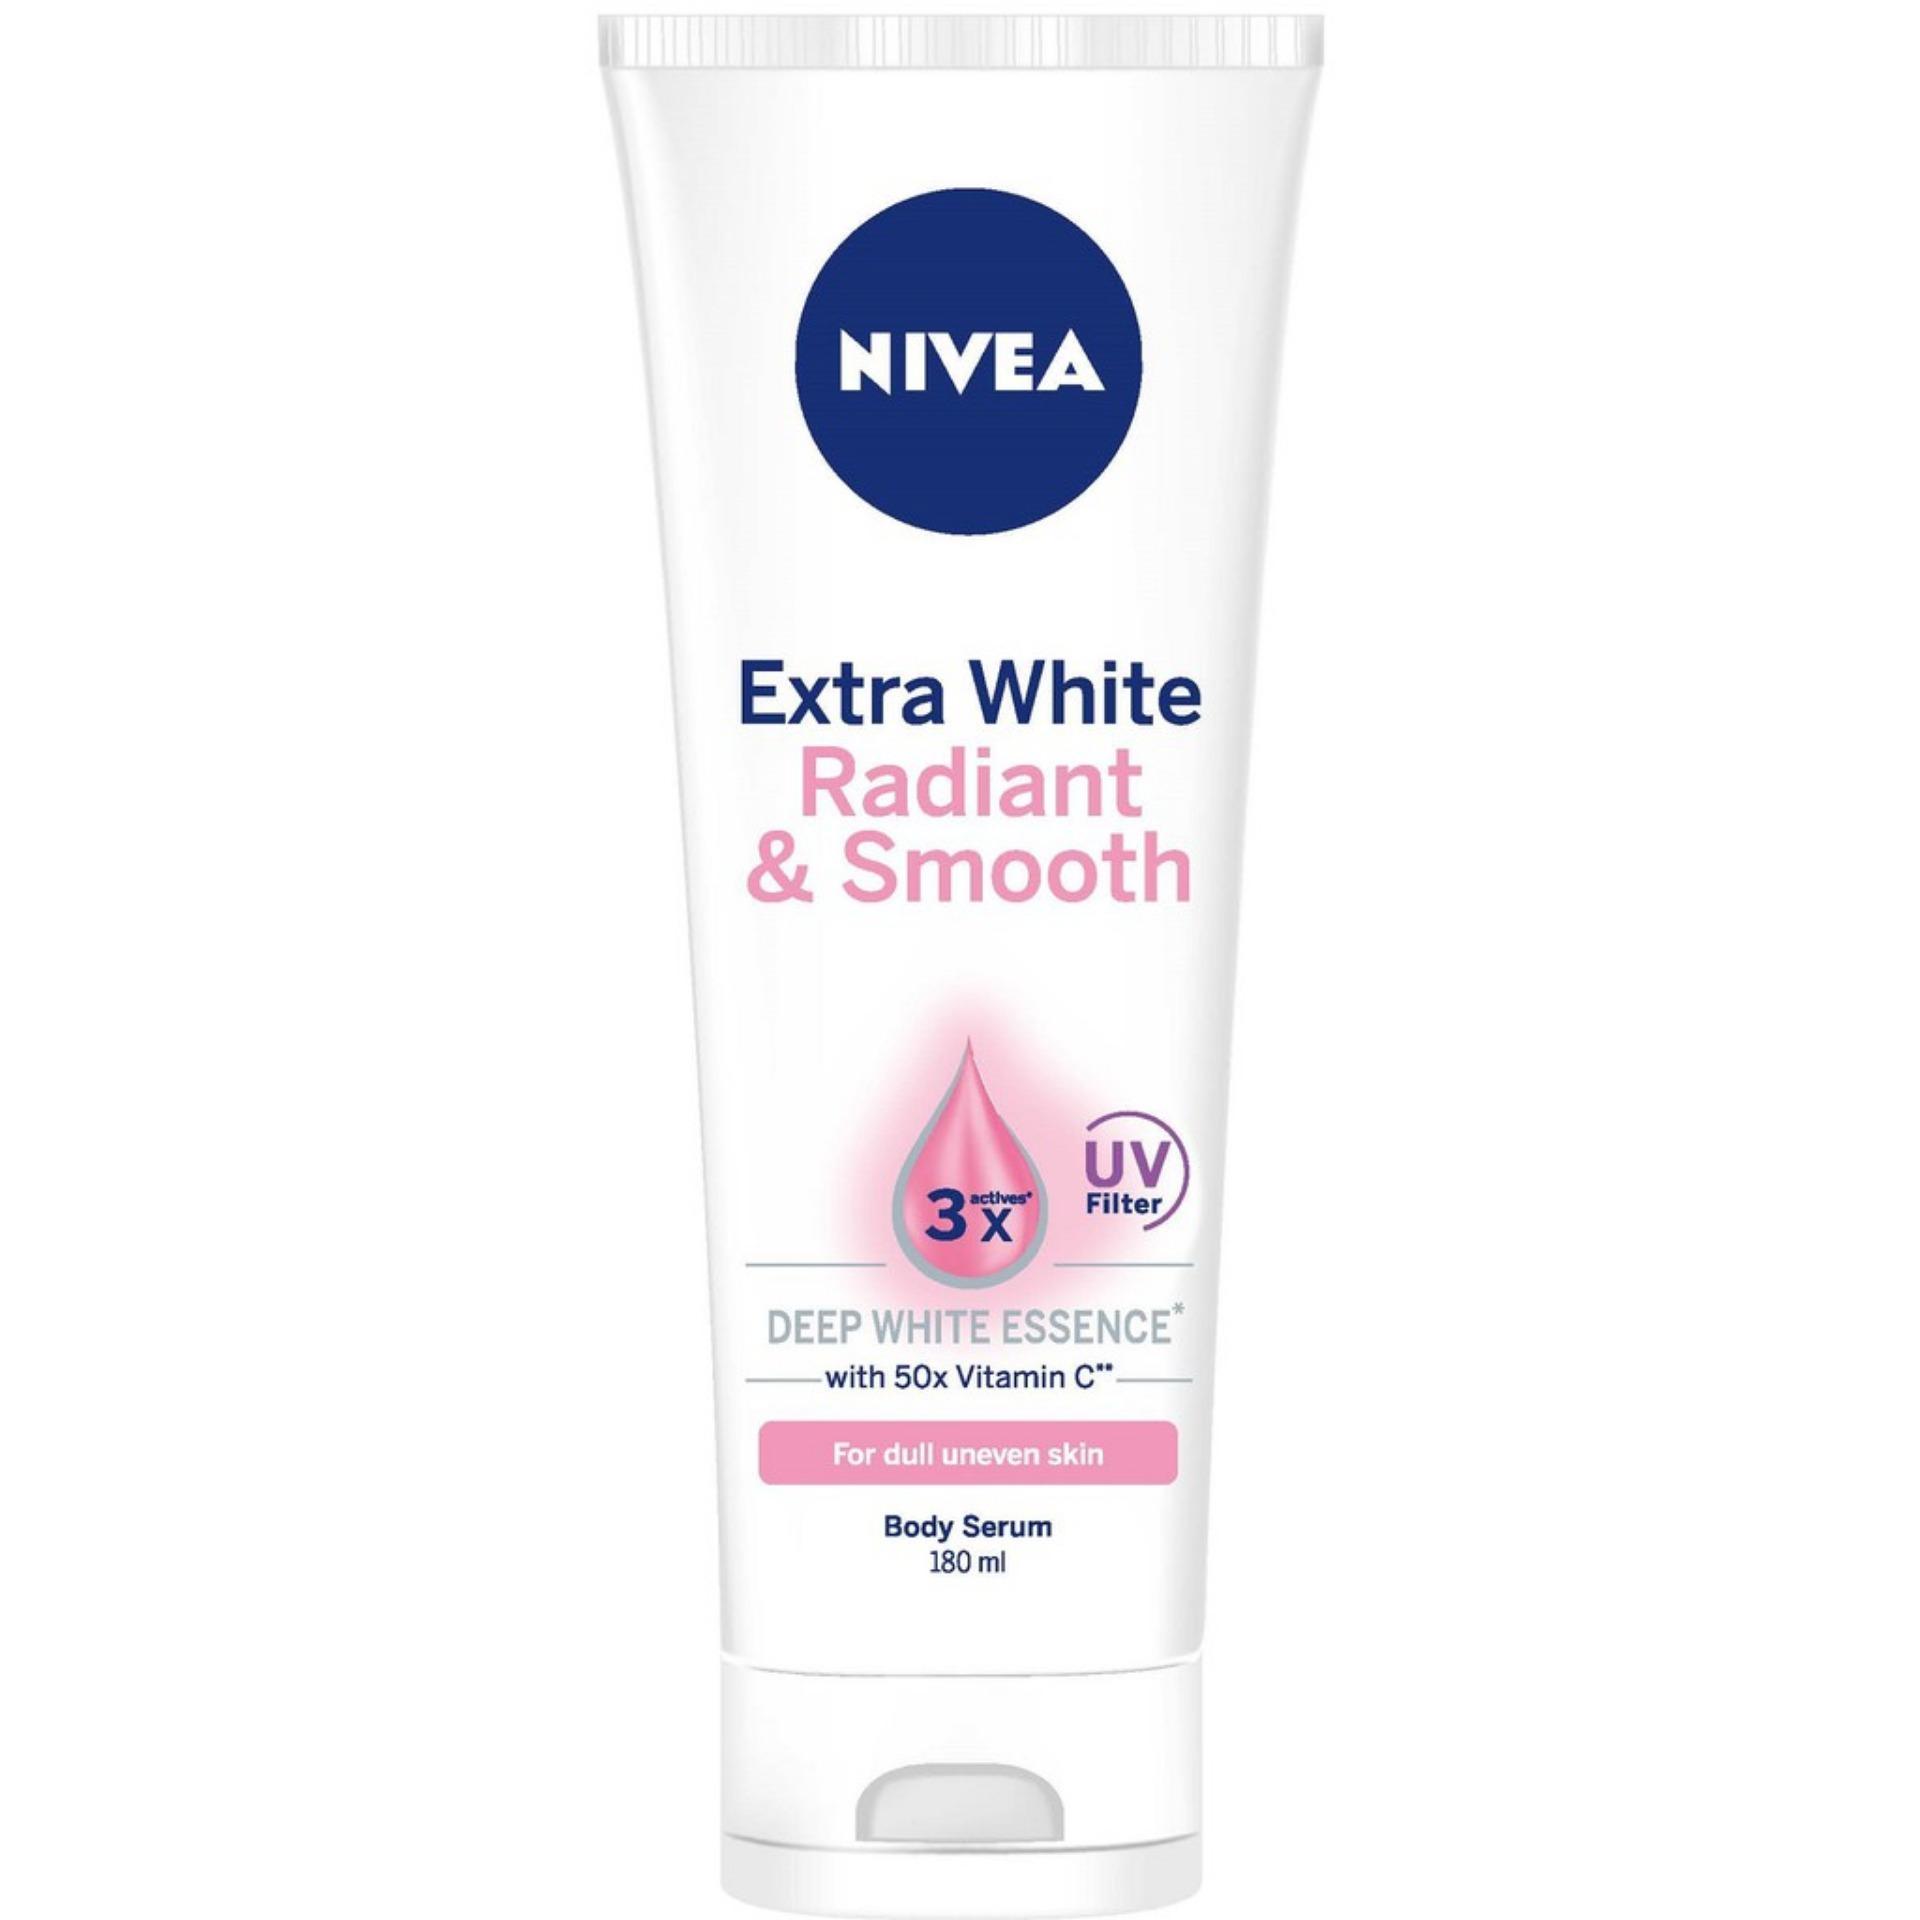 NIVEA Body Care Unisex Extra White Radiant & Smooth Serum SPF33 180ml